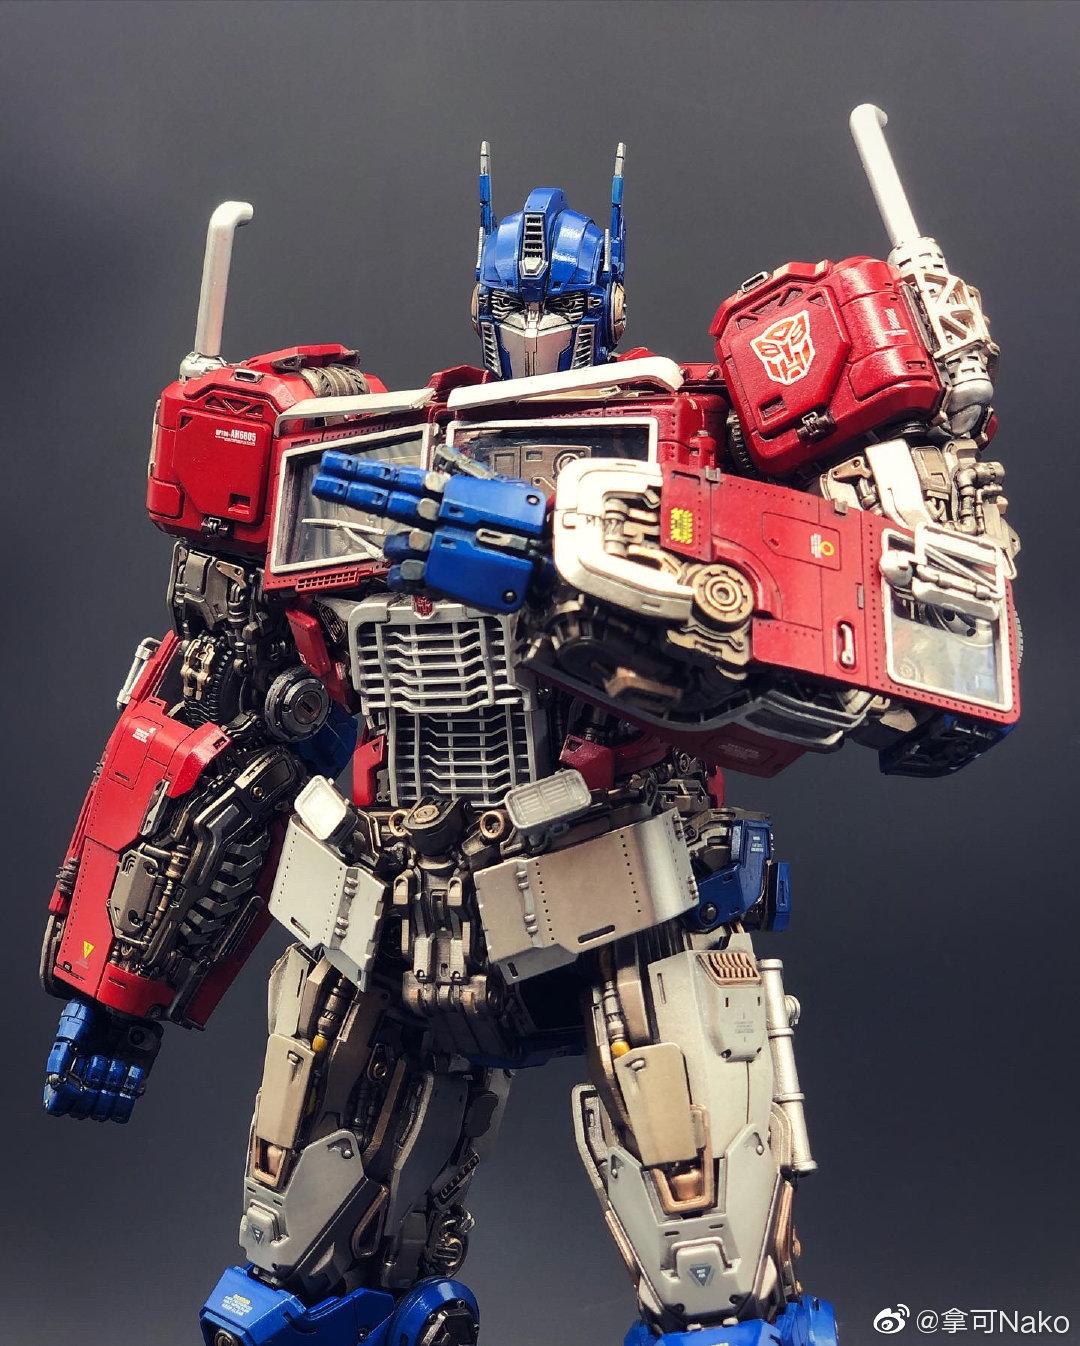 G798_NakoMake_Optimus_Prime_BUMBLEBEE_ver_GK_037.jpg